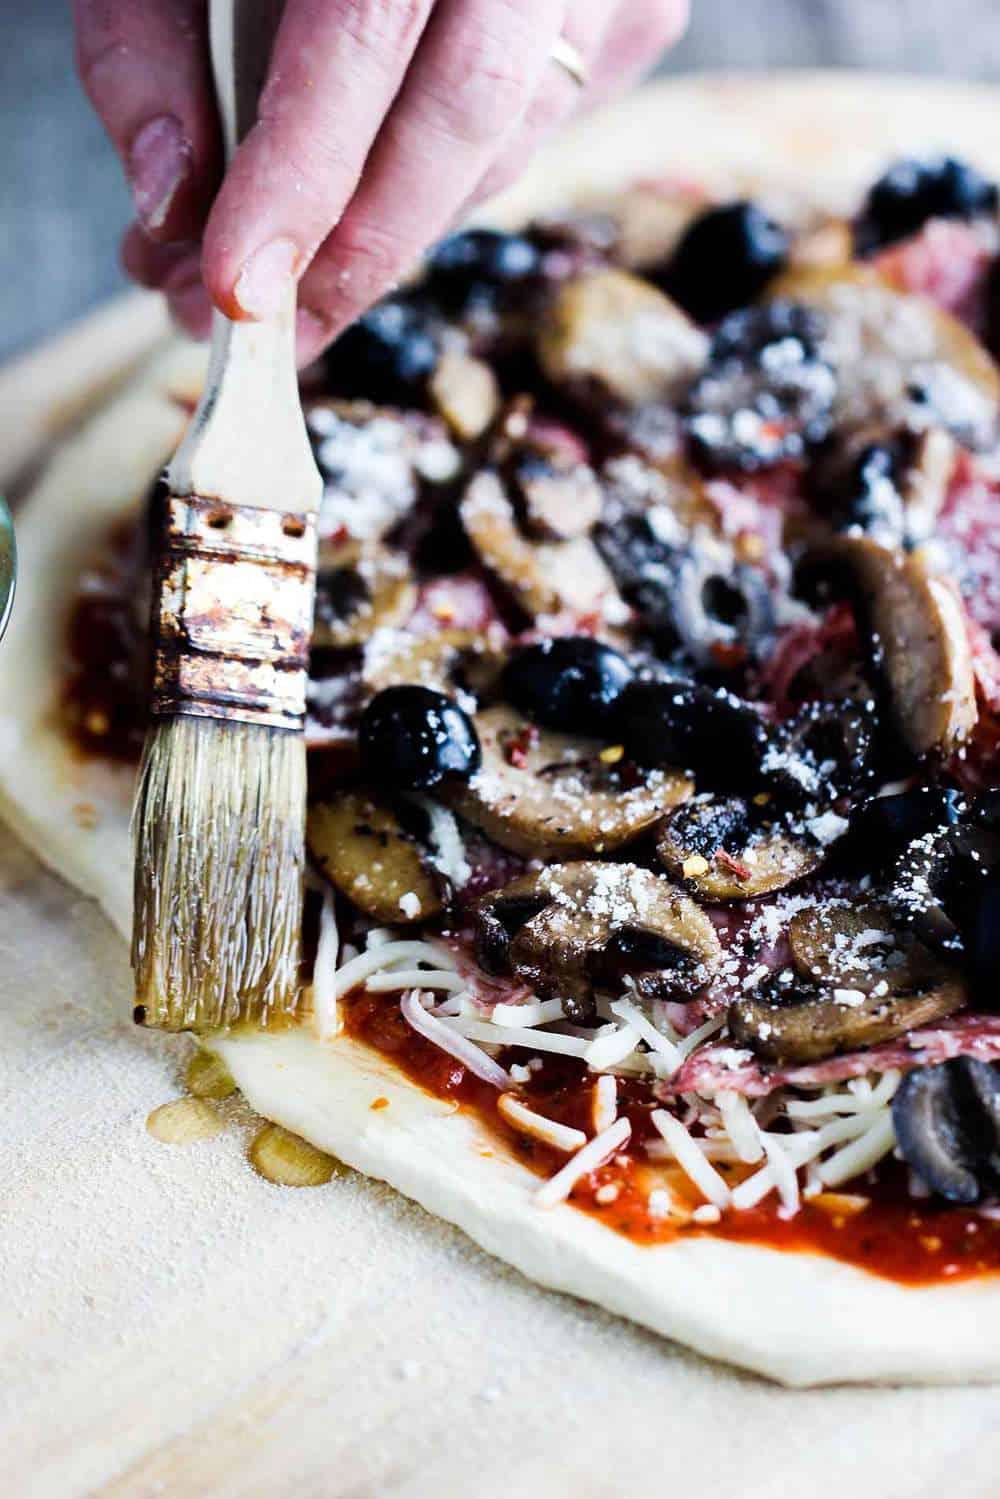 Soppressata, Mushroom and Black Olive Pizza recipe